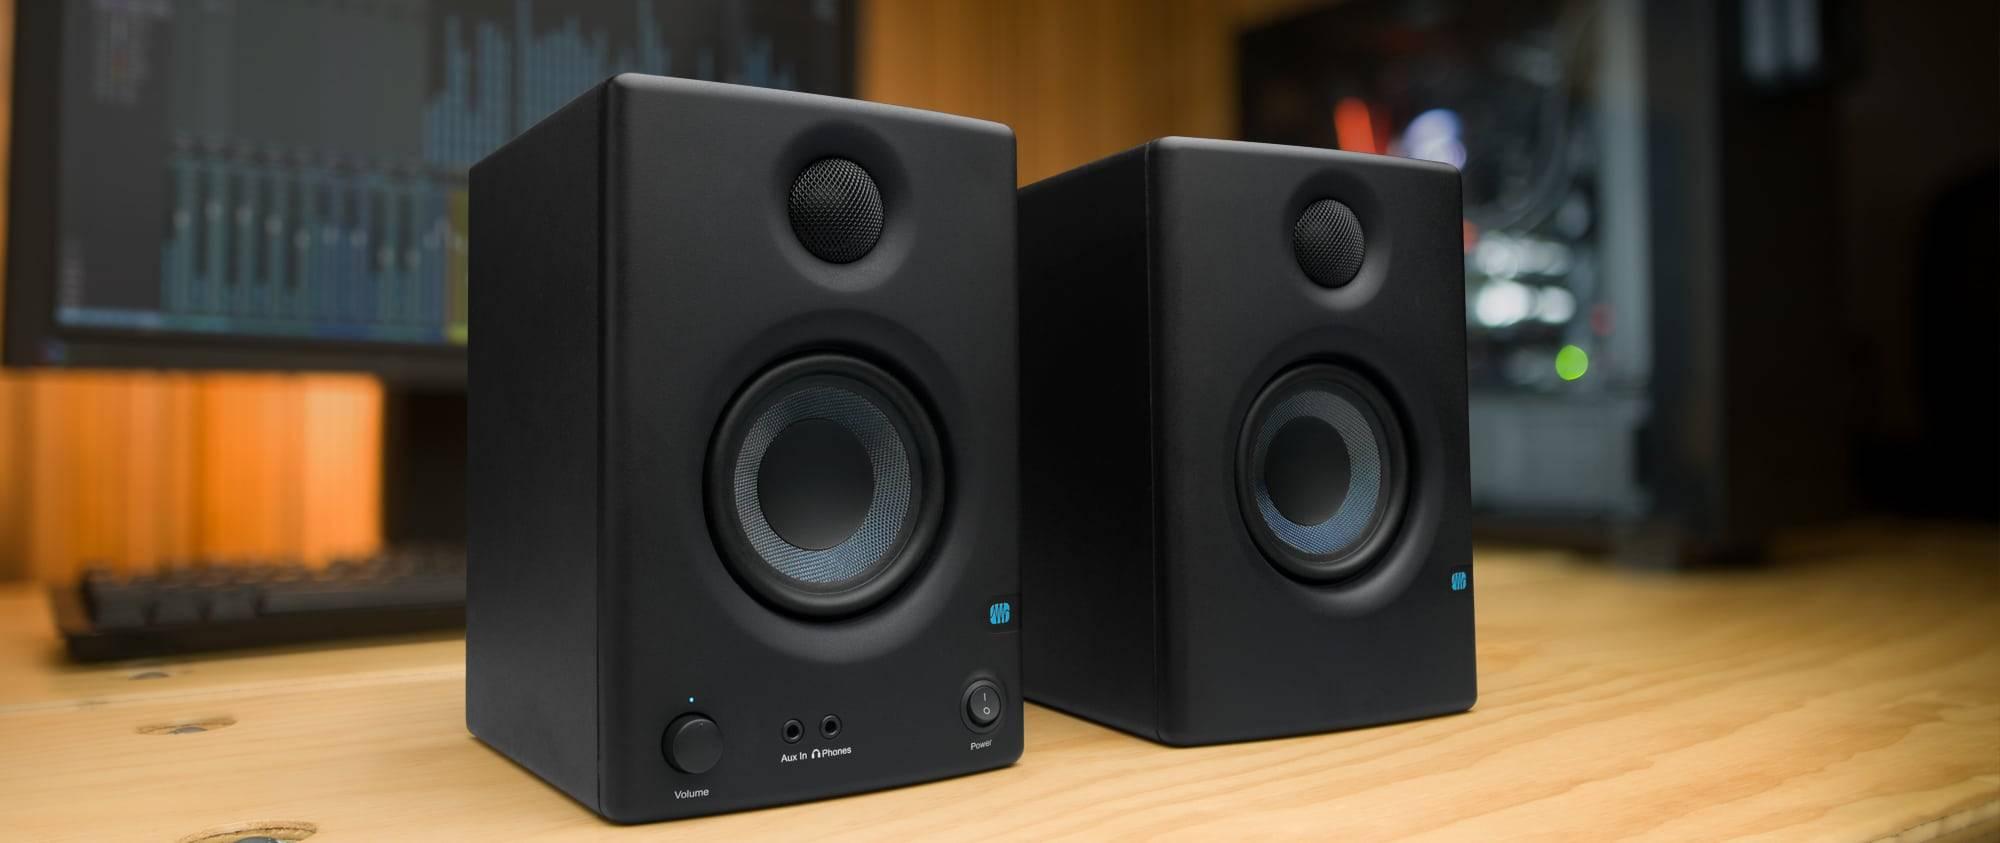 Review of the Presonus Eris 3.5 Speakers